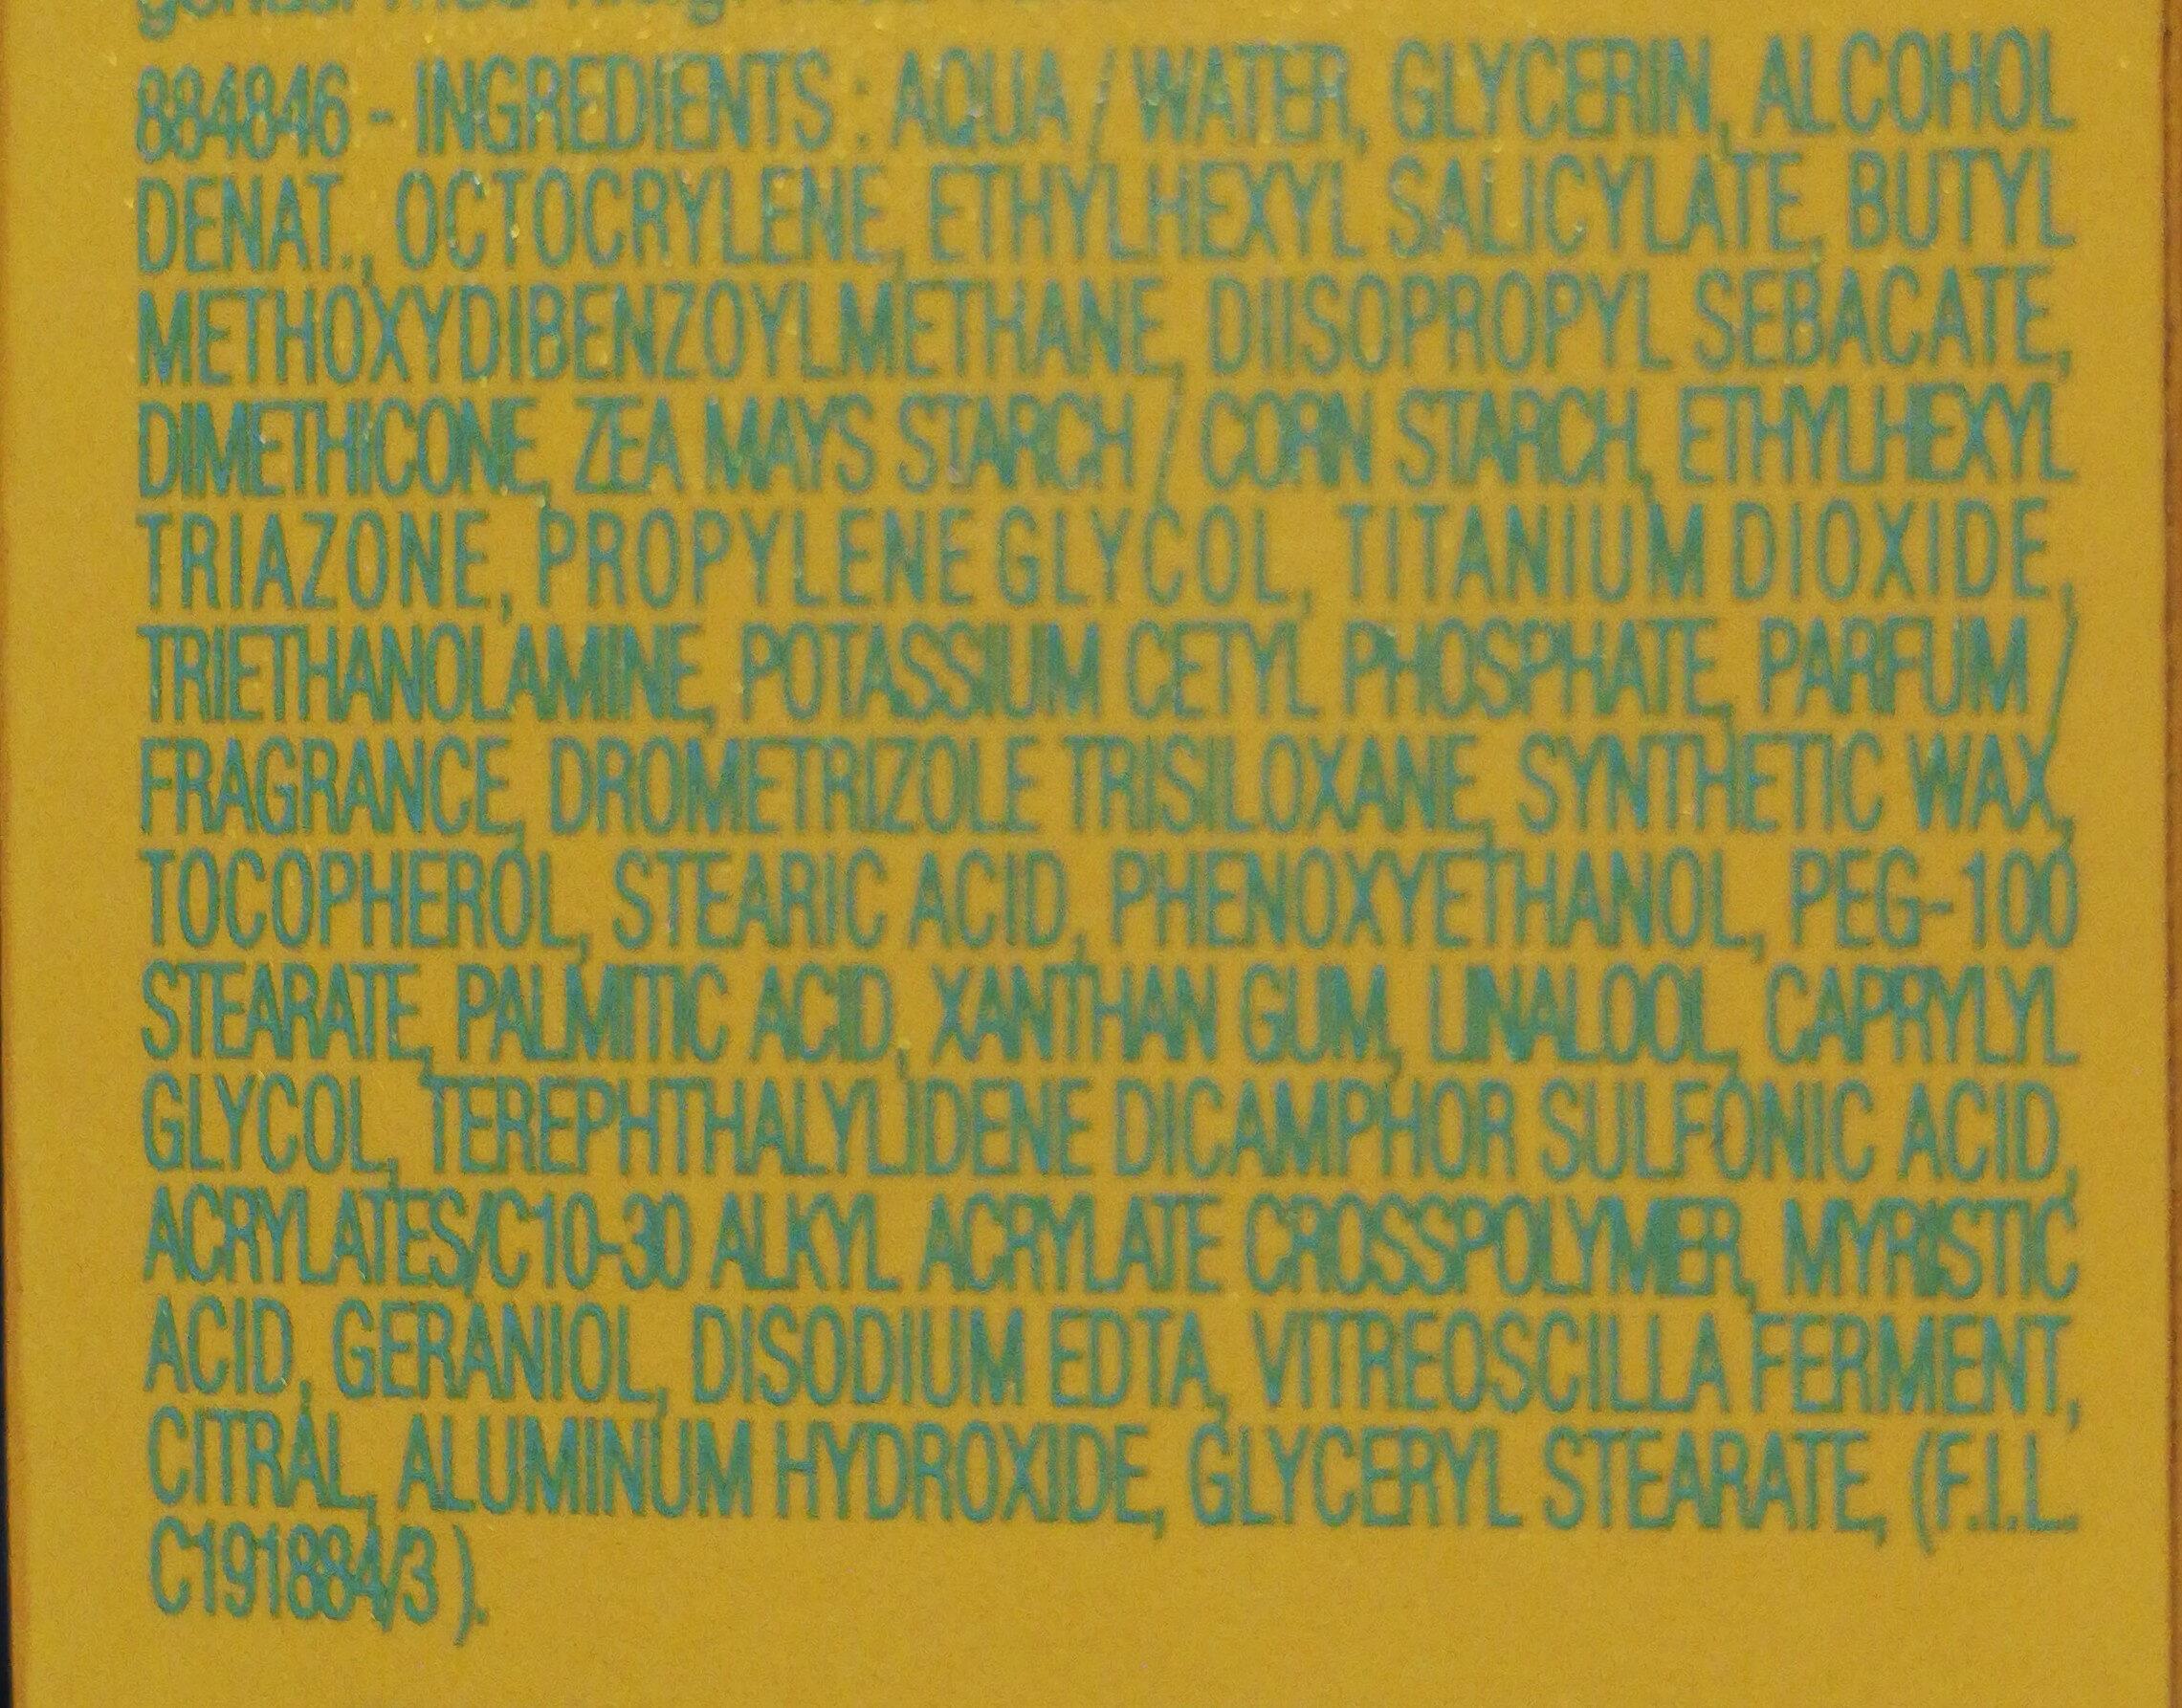 Biotherm Anti-wrinkles sun cream - Ingredients